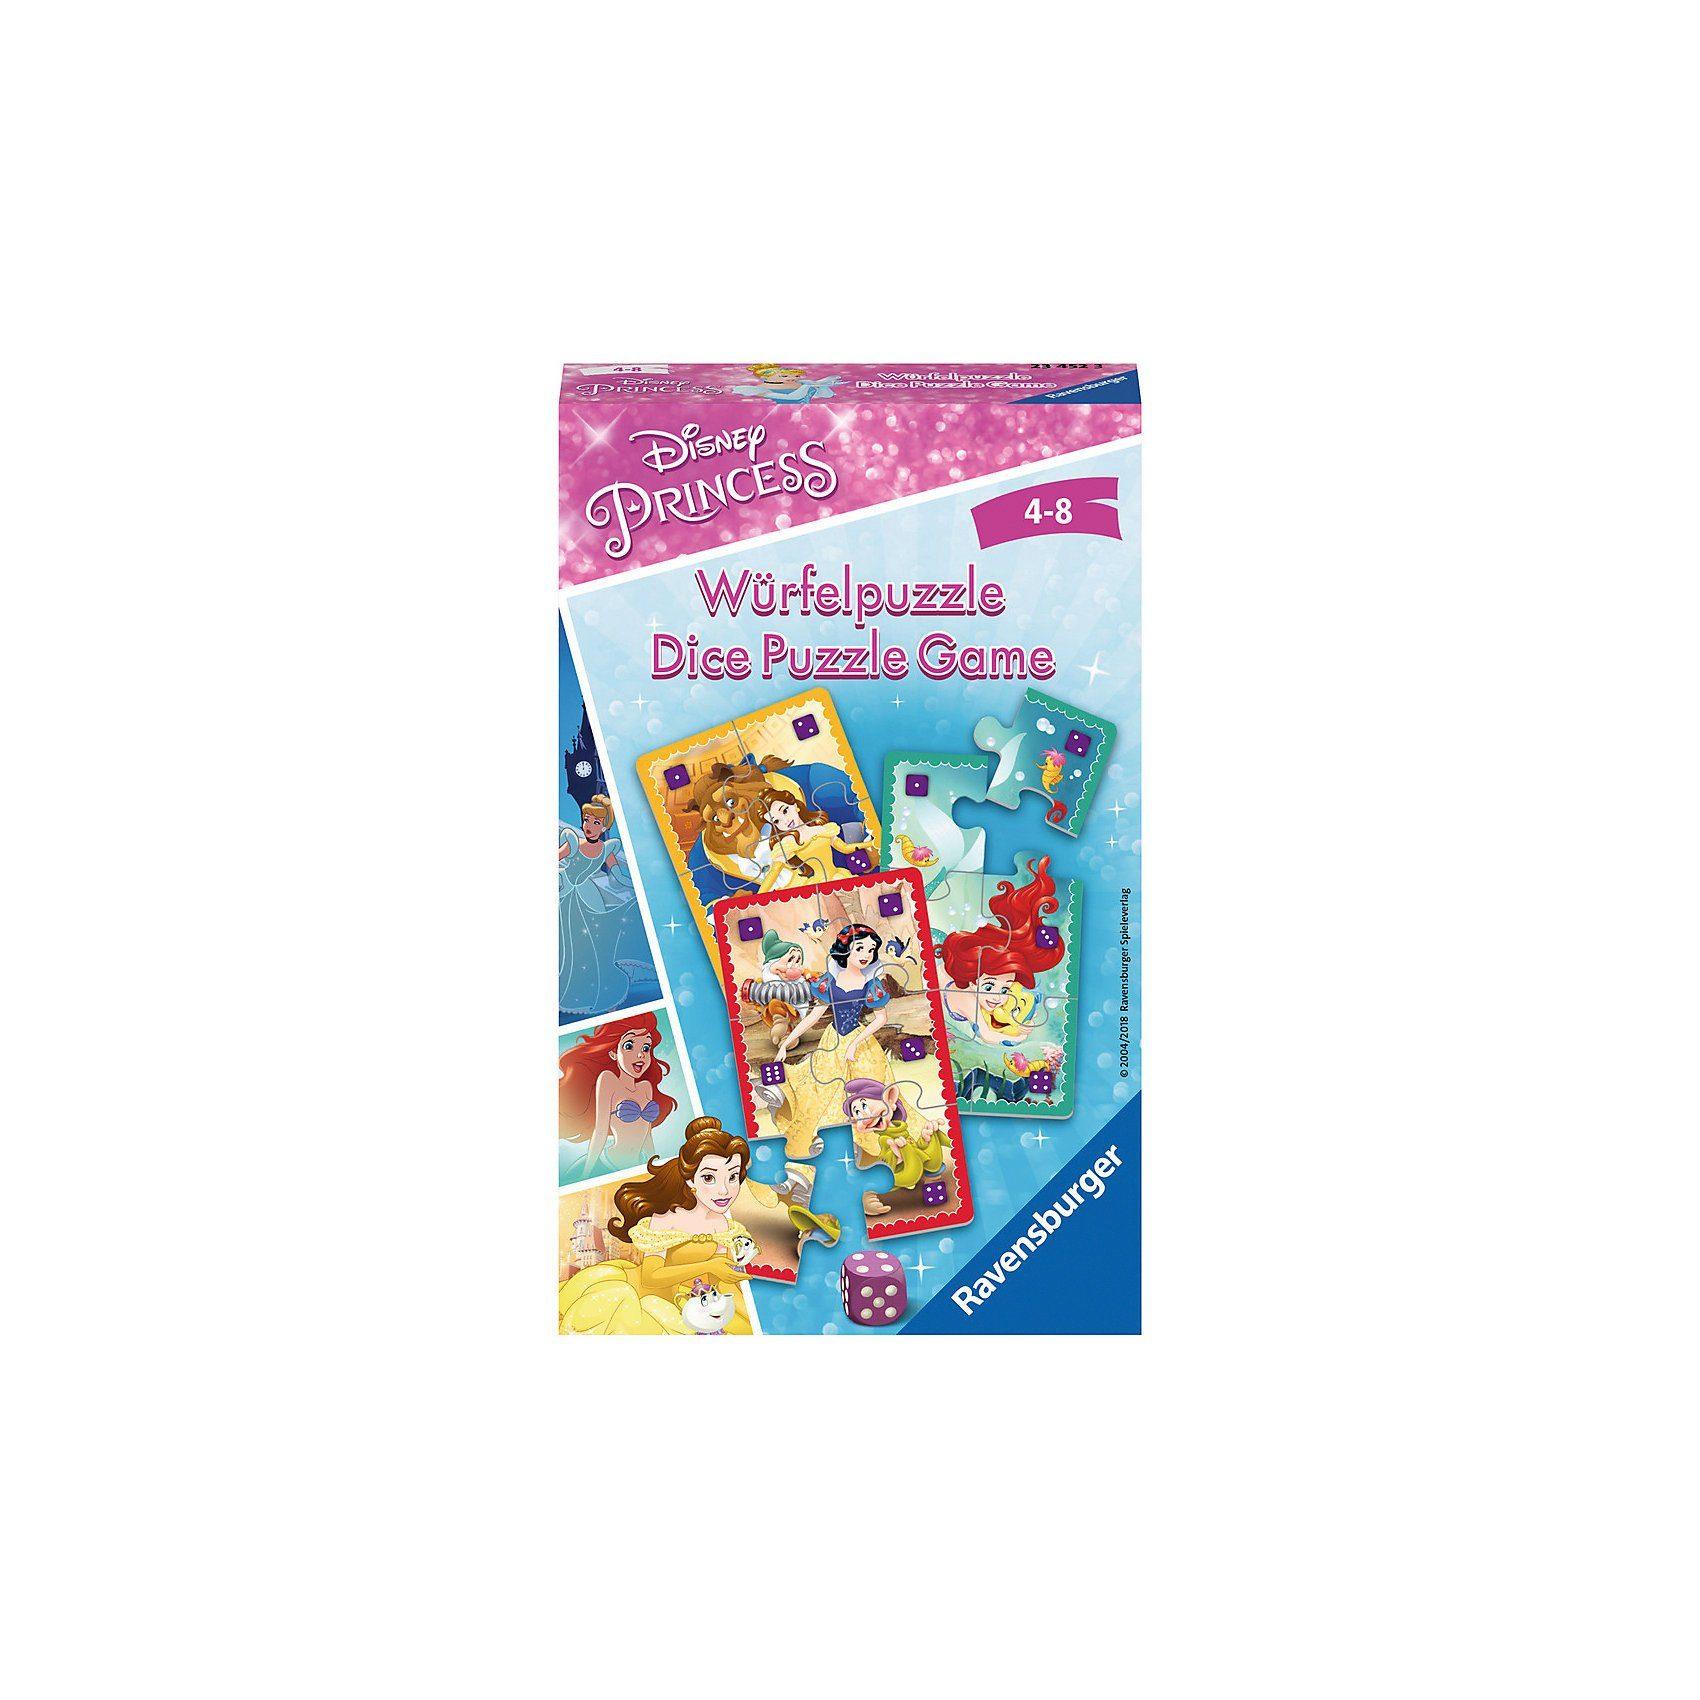 Ravensburger Disney Princess: Würfelpuzzle